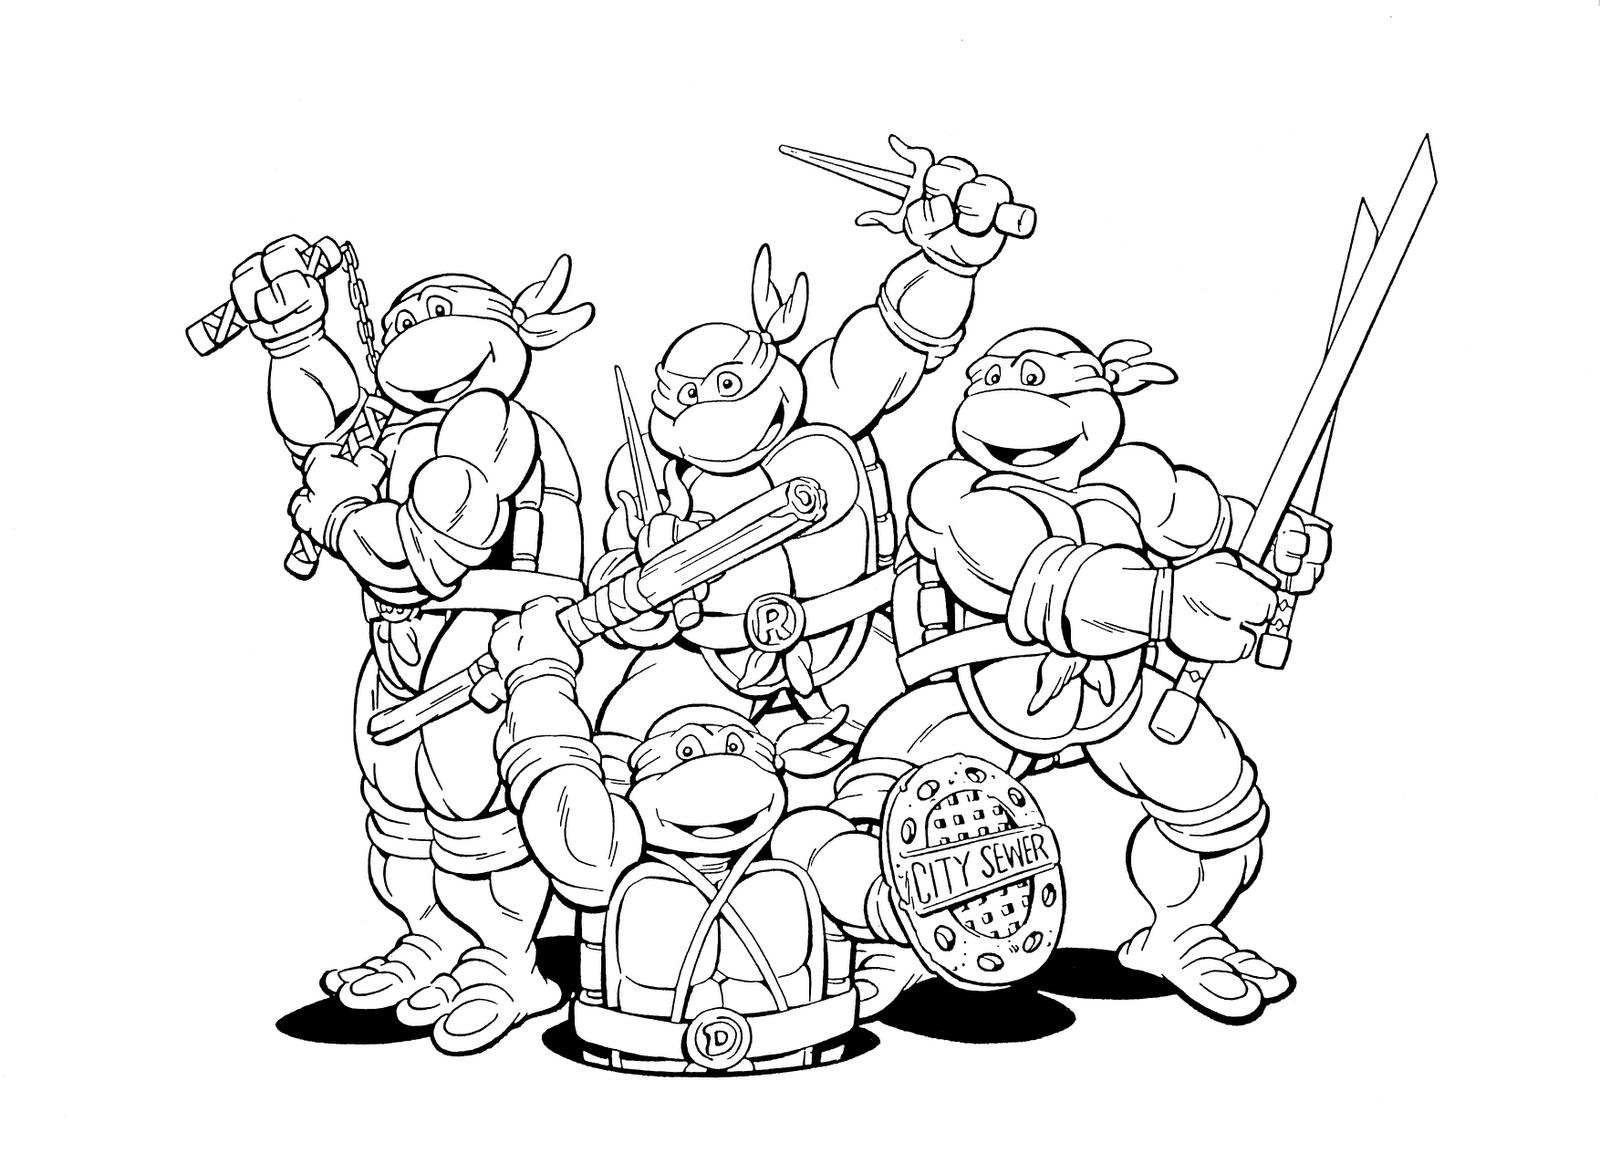 Ninja turtle coloring pages free printable pictures for Free ninja coloring pages